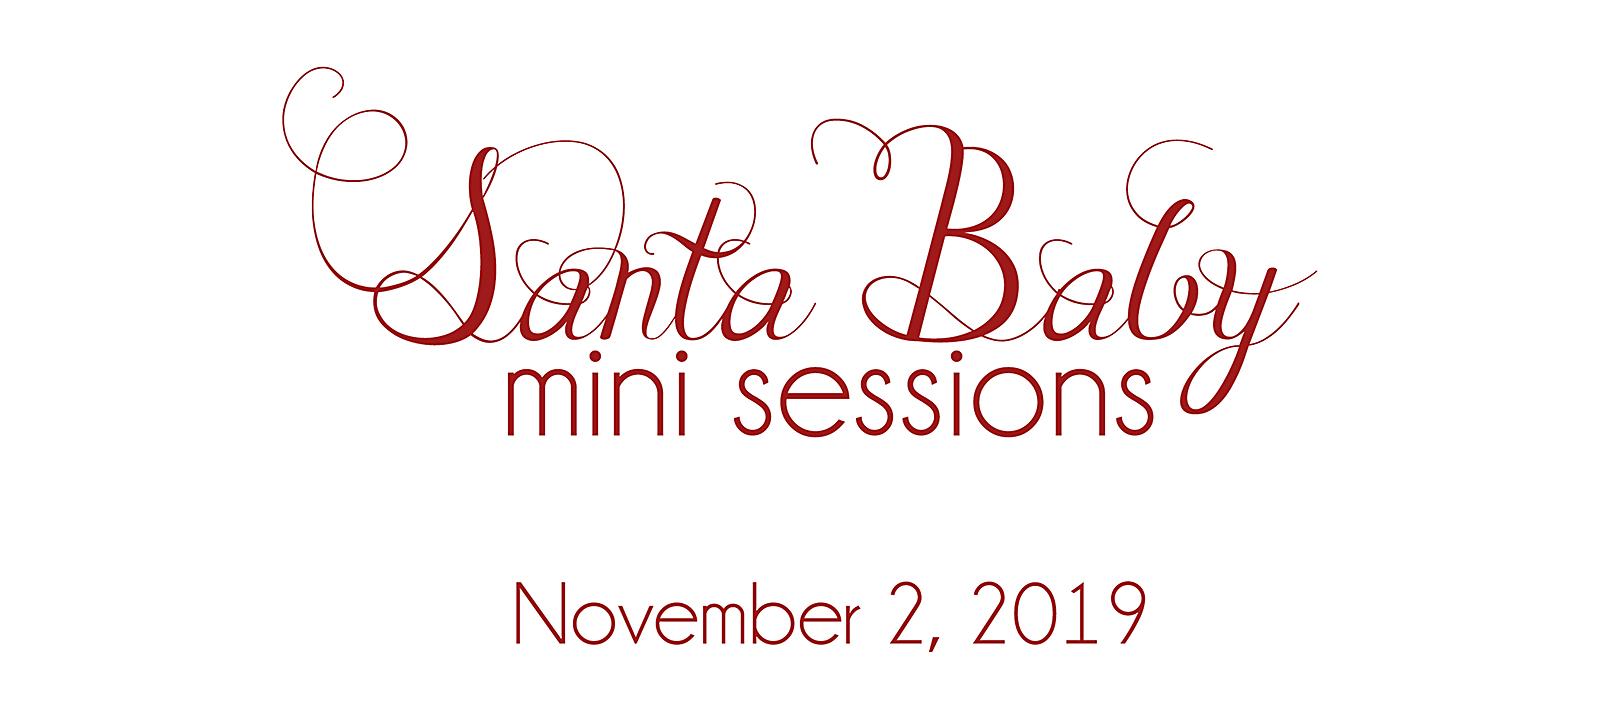 Santa baby mini sessions